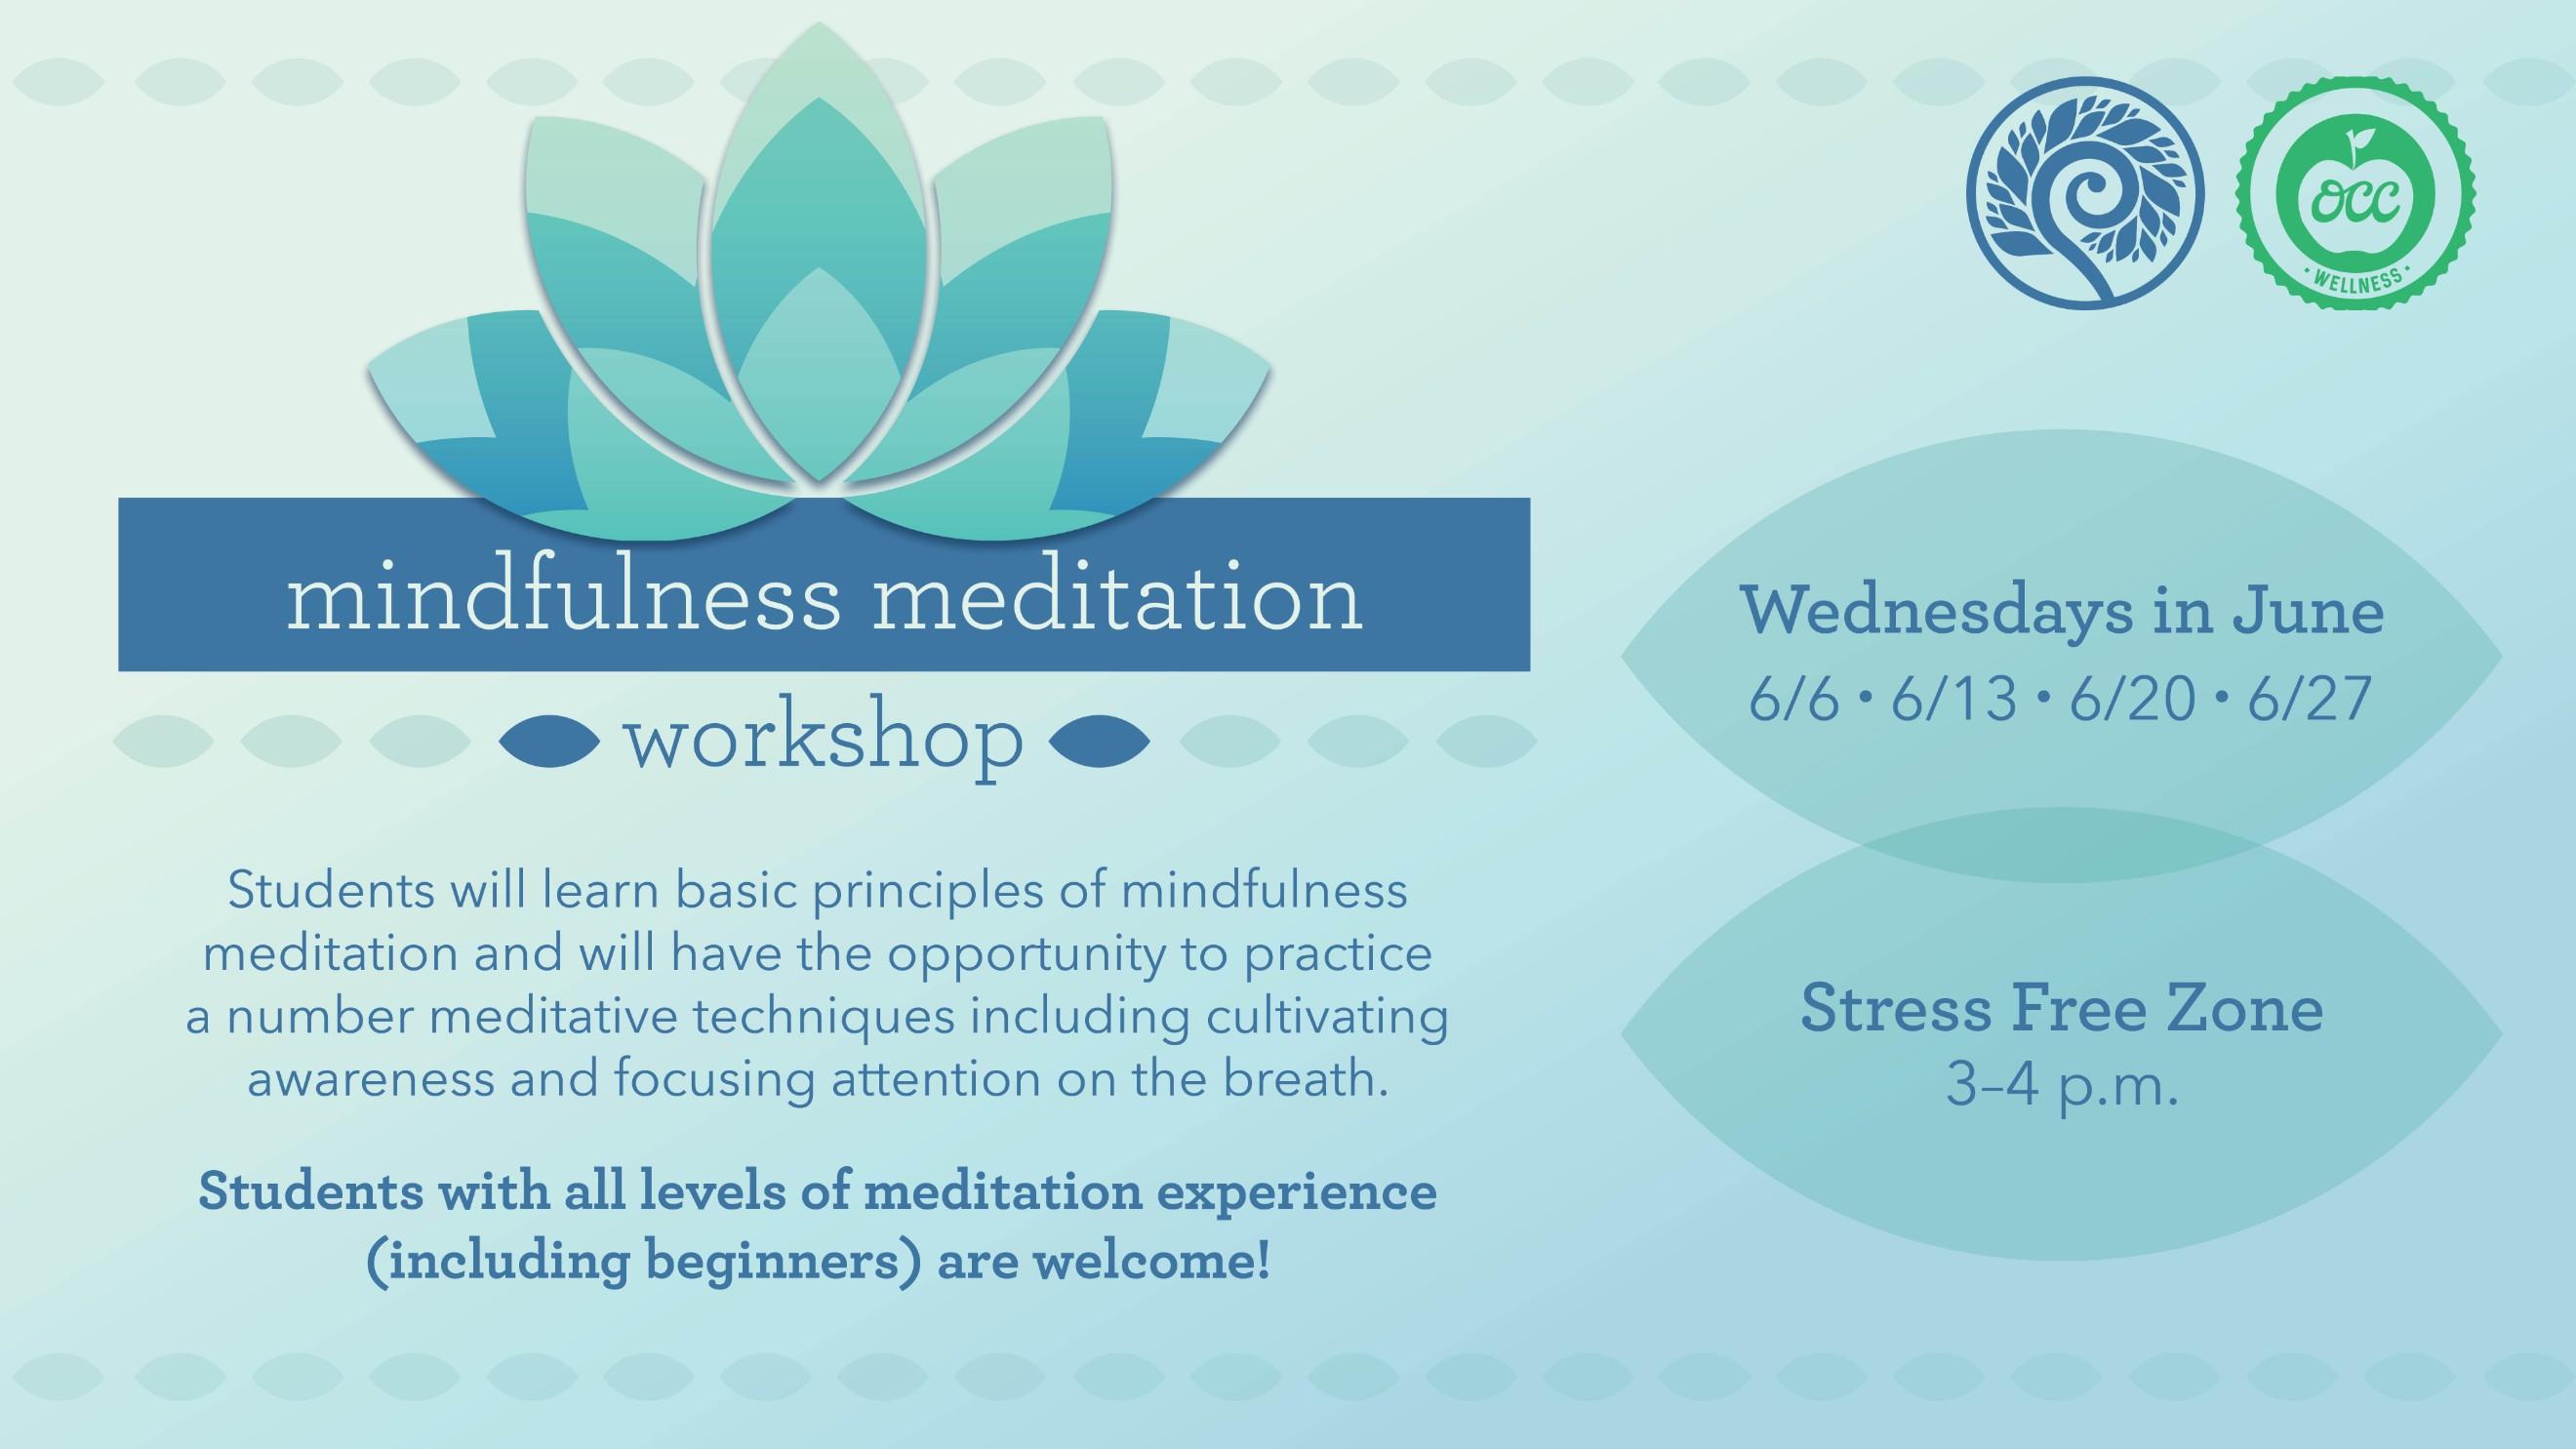 Mindfulness Meditation_June 27